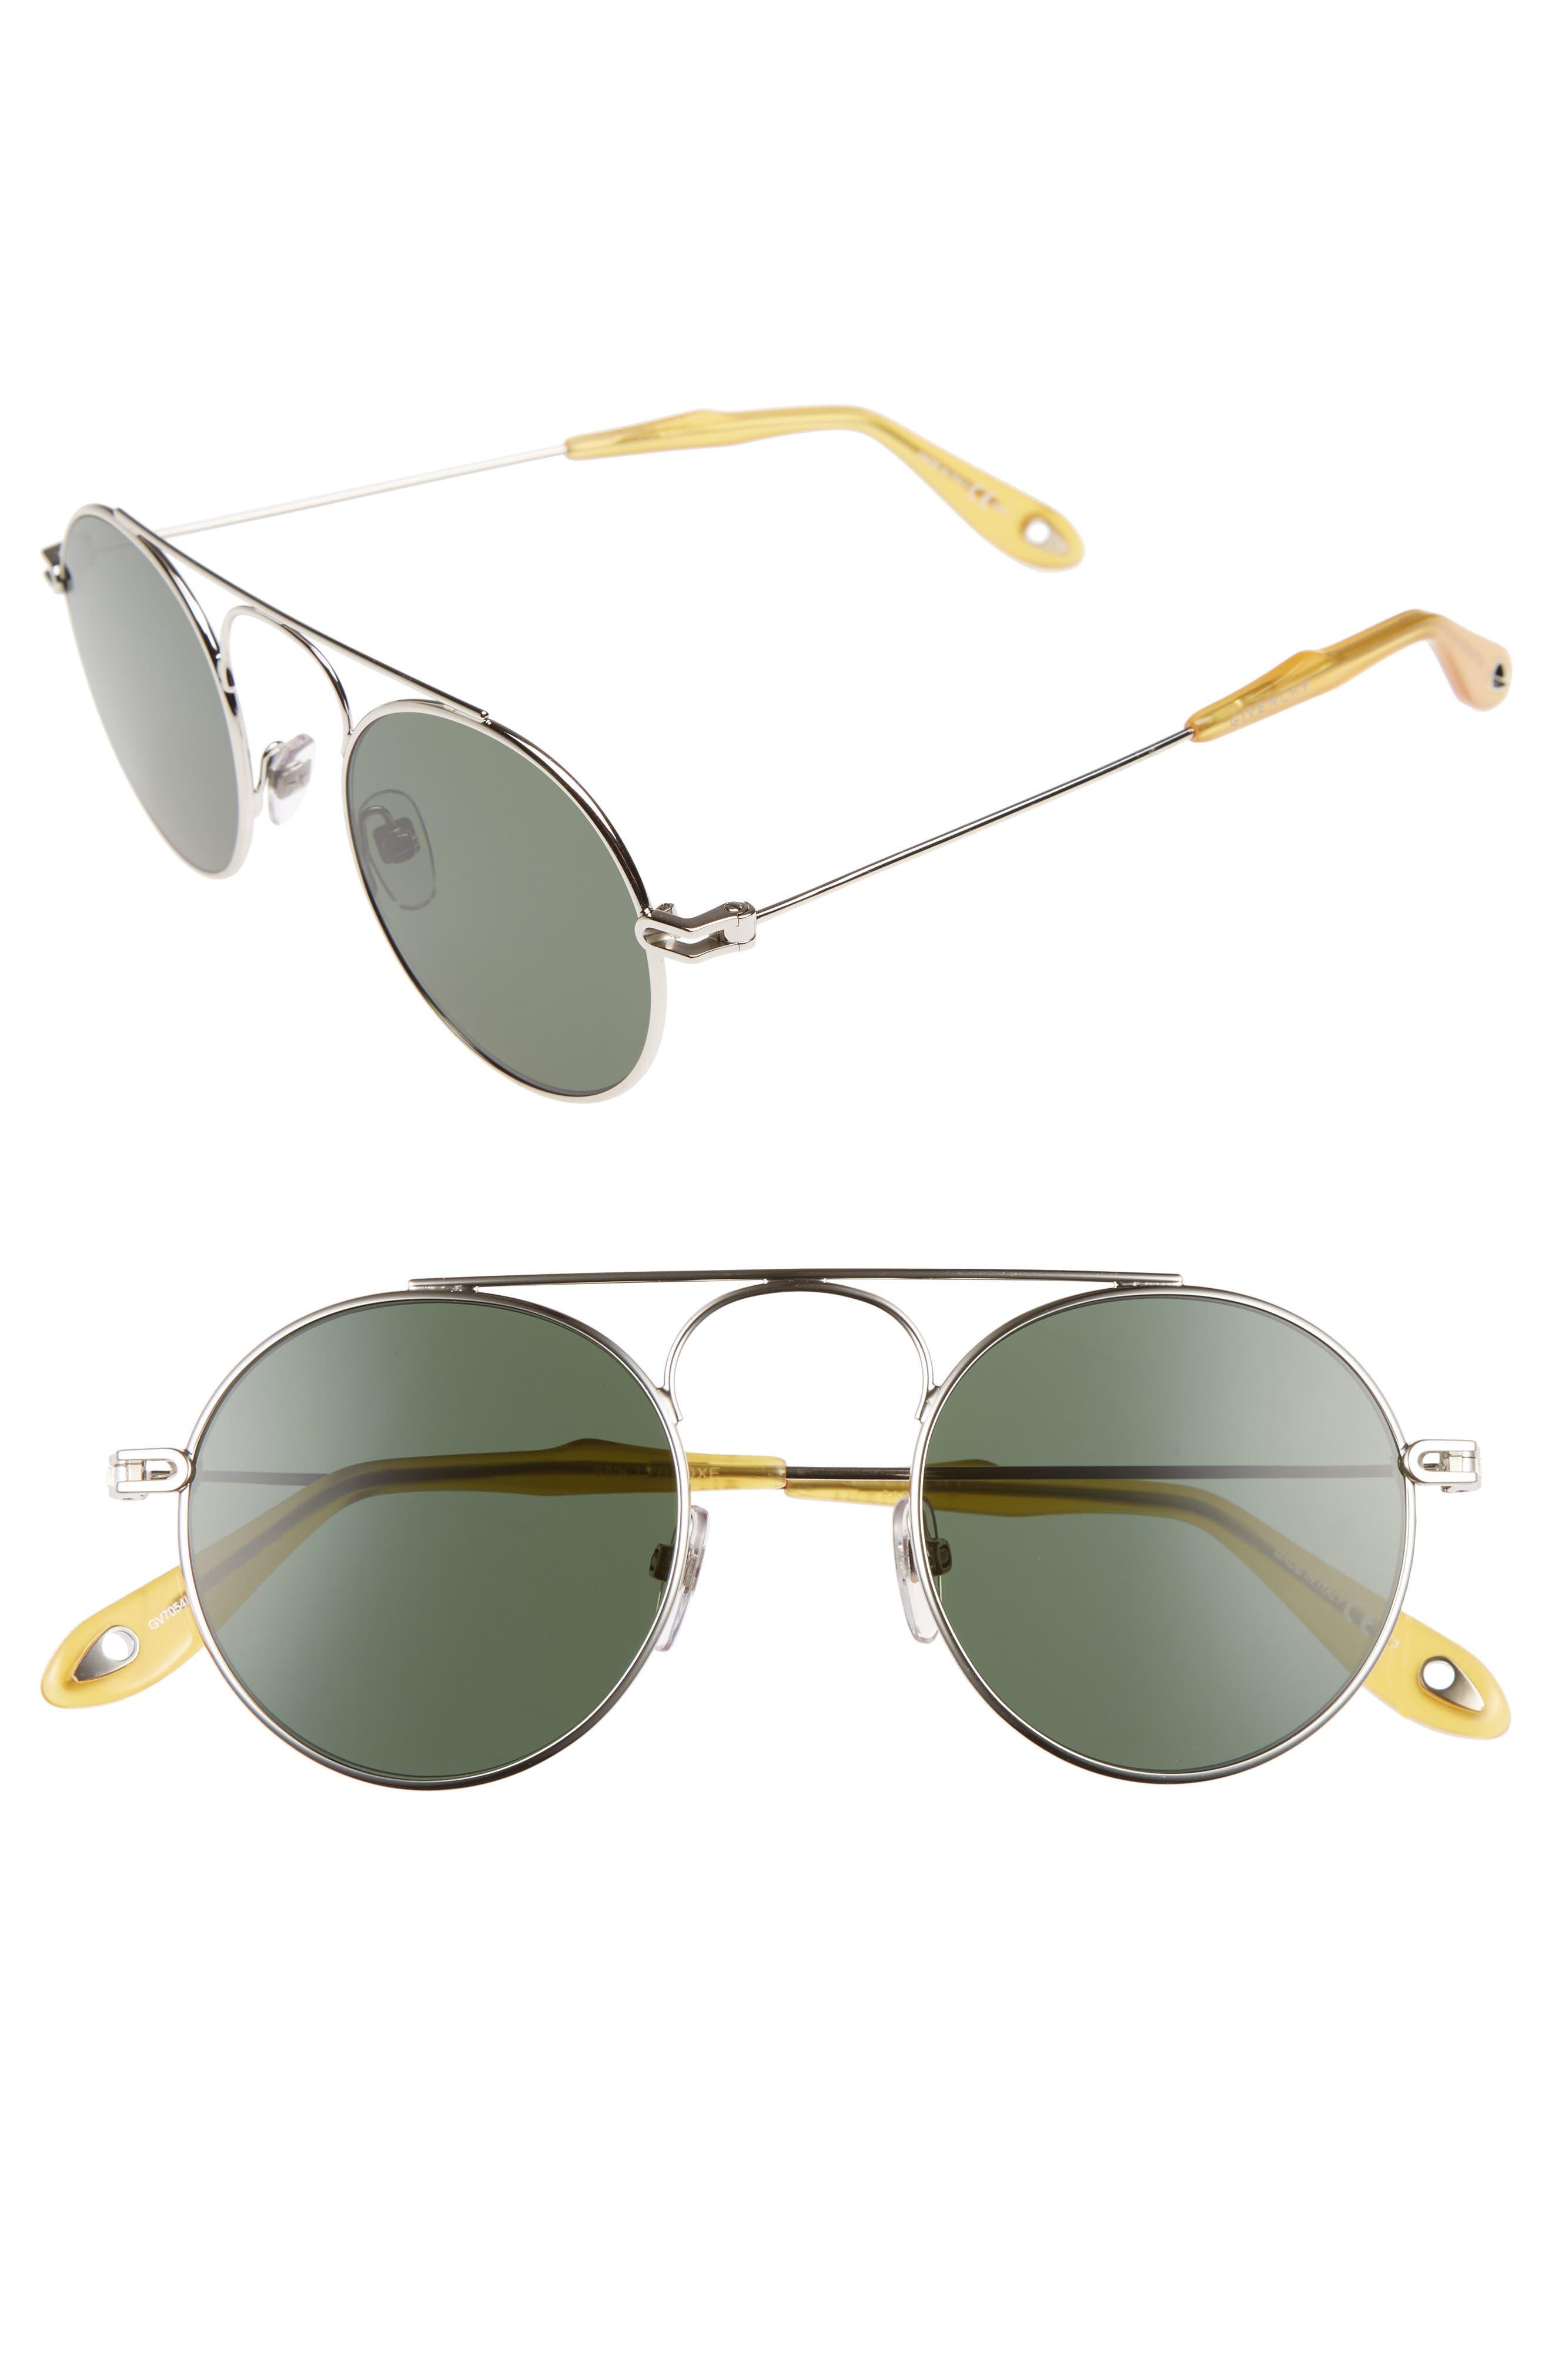 48mm Round Sunglasses,                         Main,                         color, 043